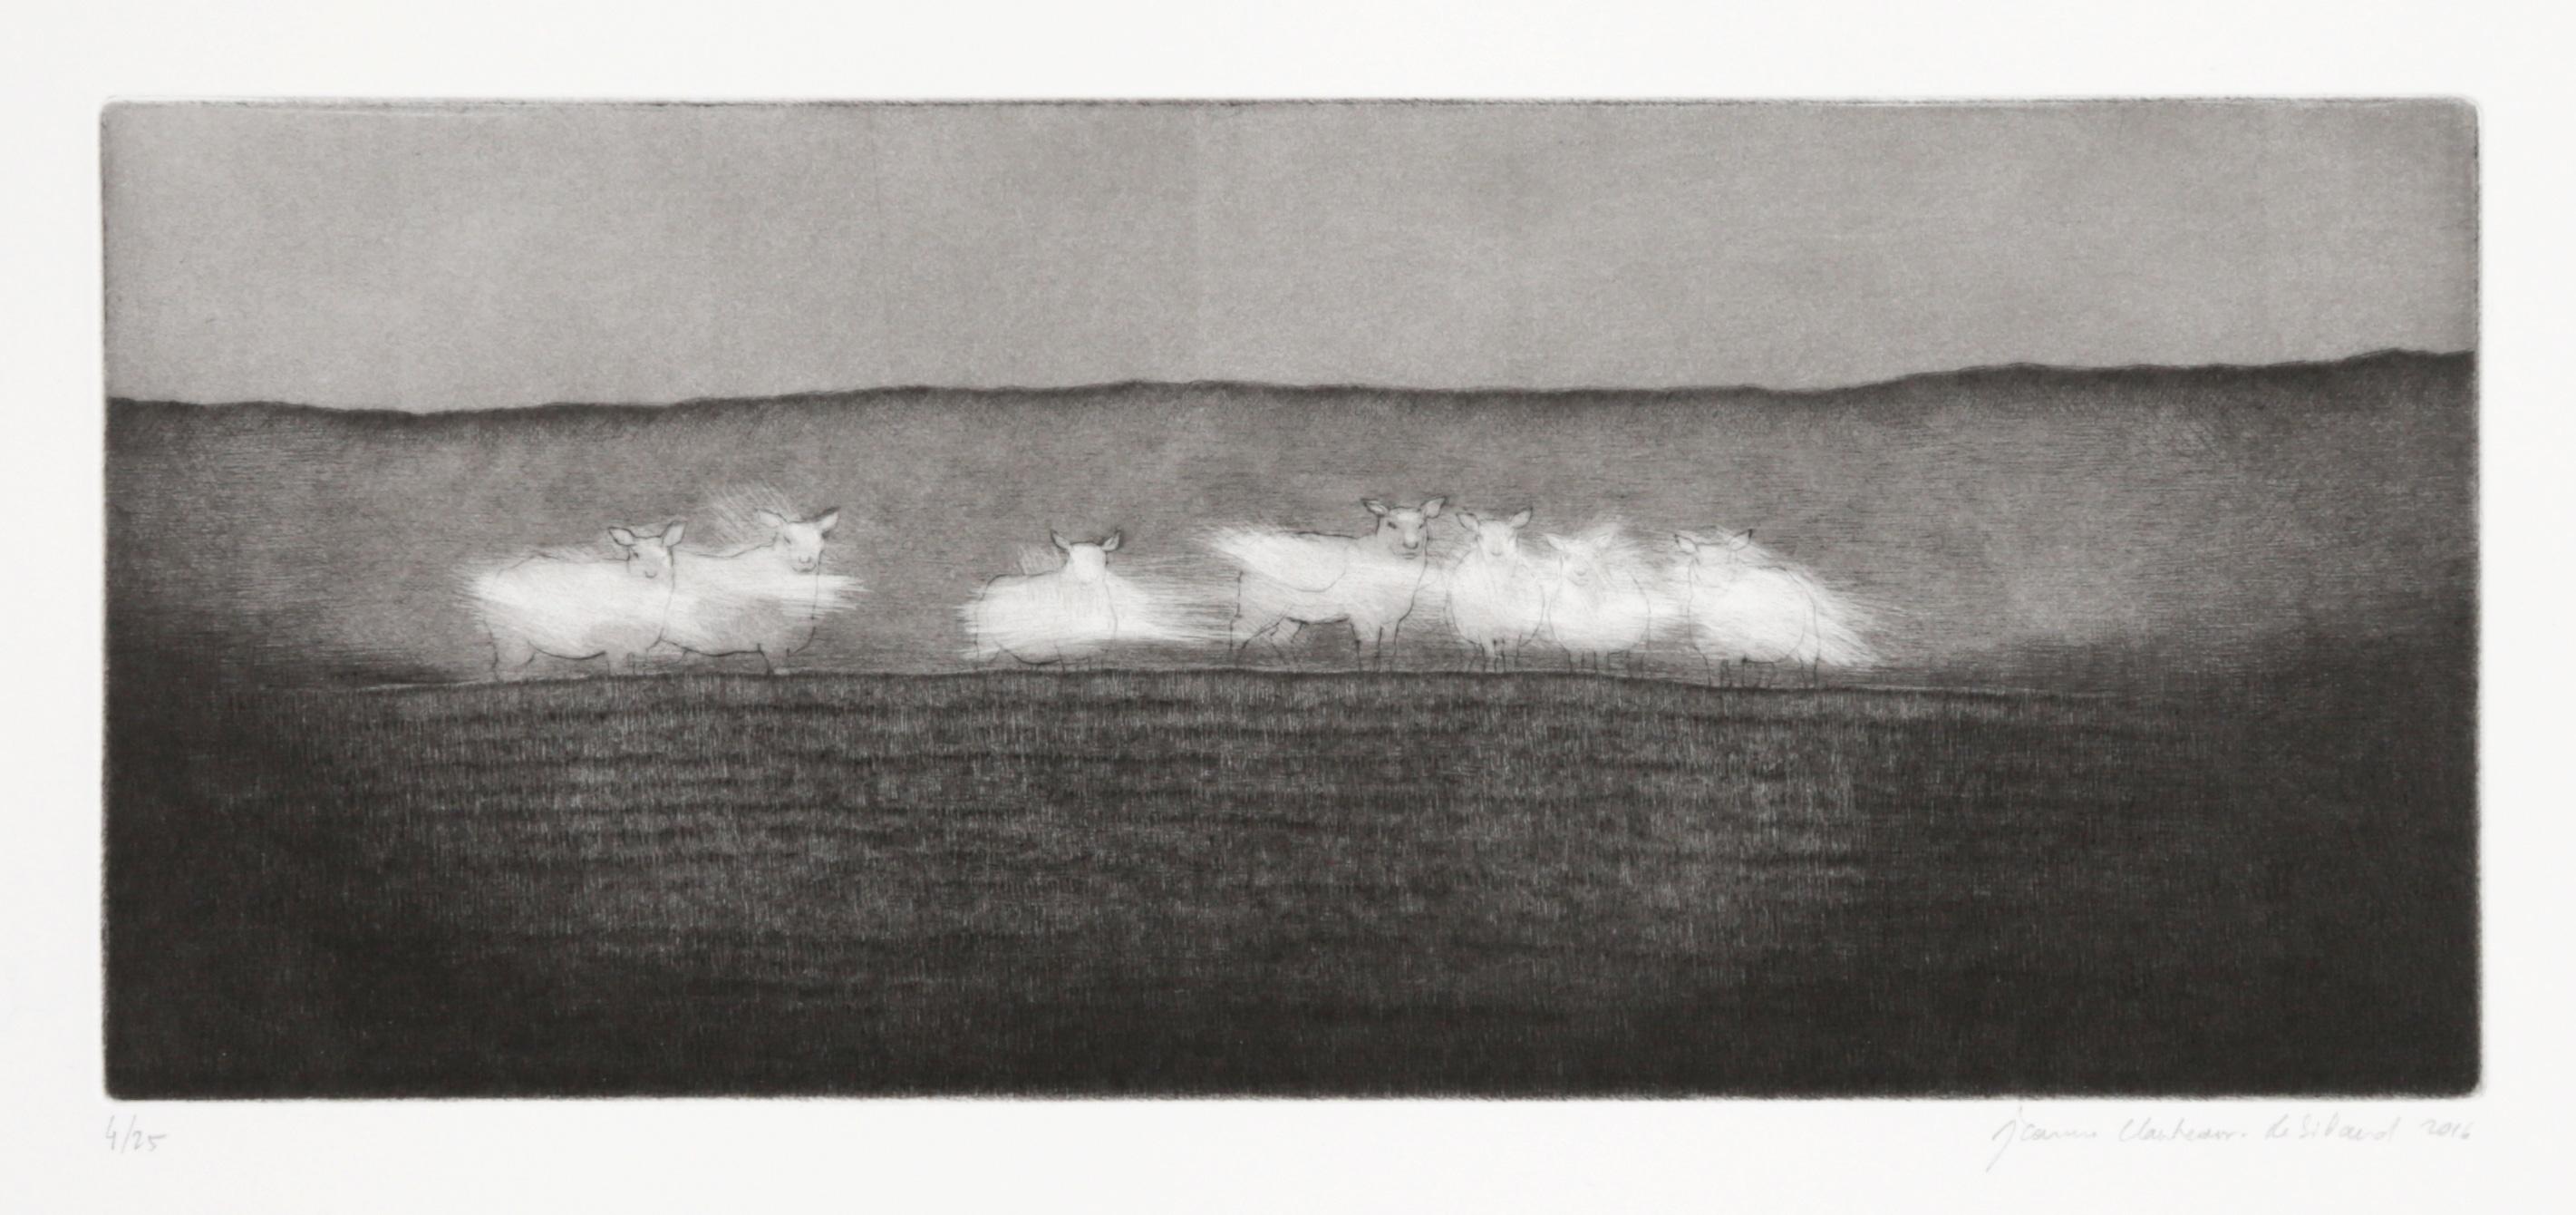 Clauteaux-Rebillaud-gravure 3-15x35